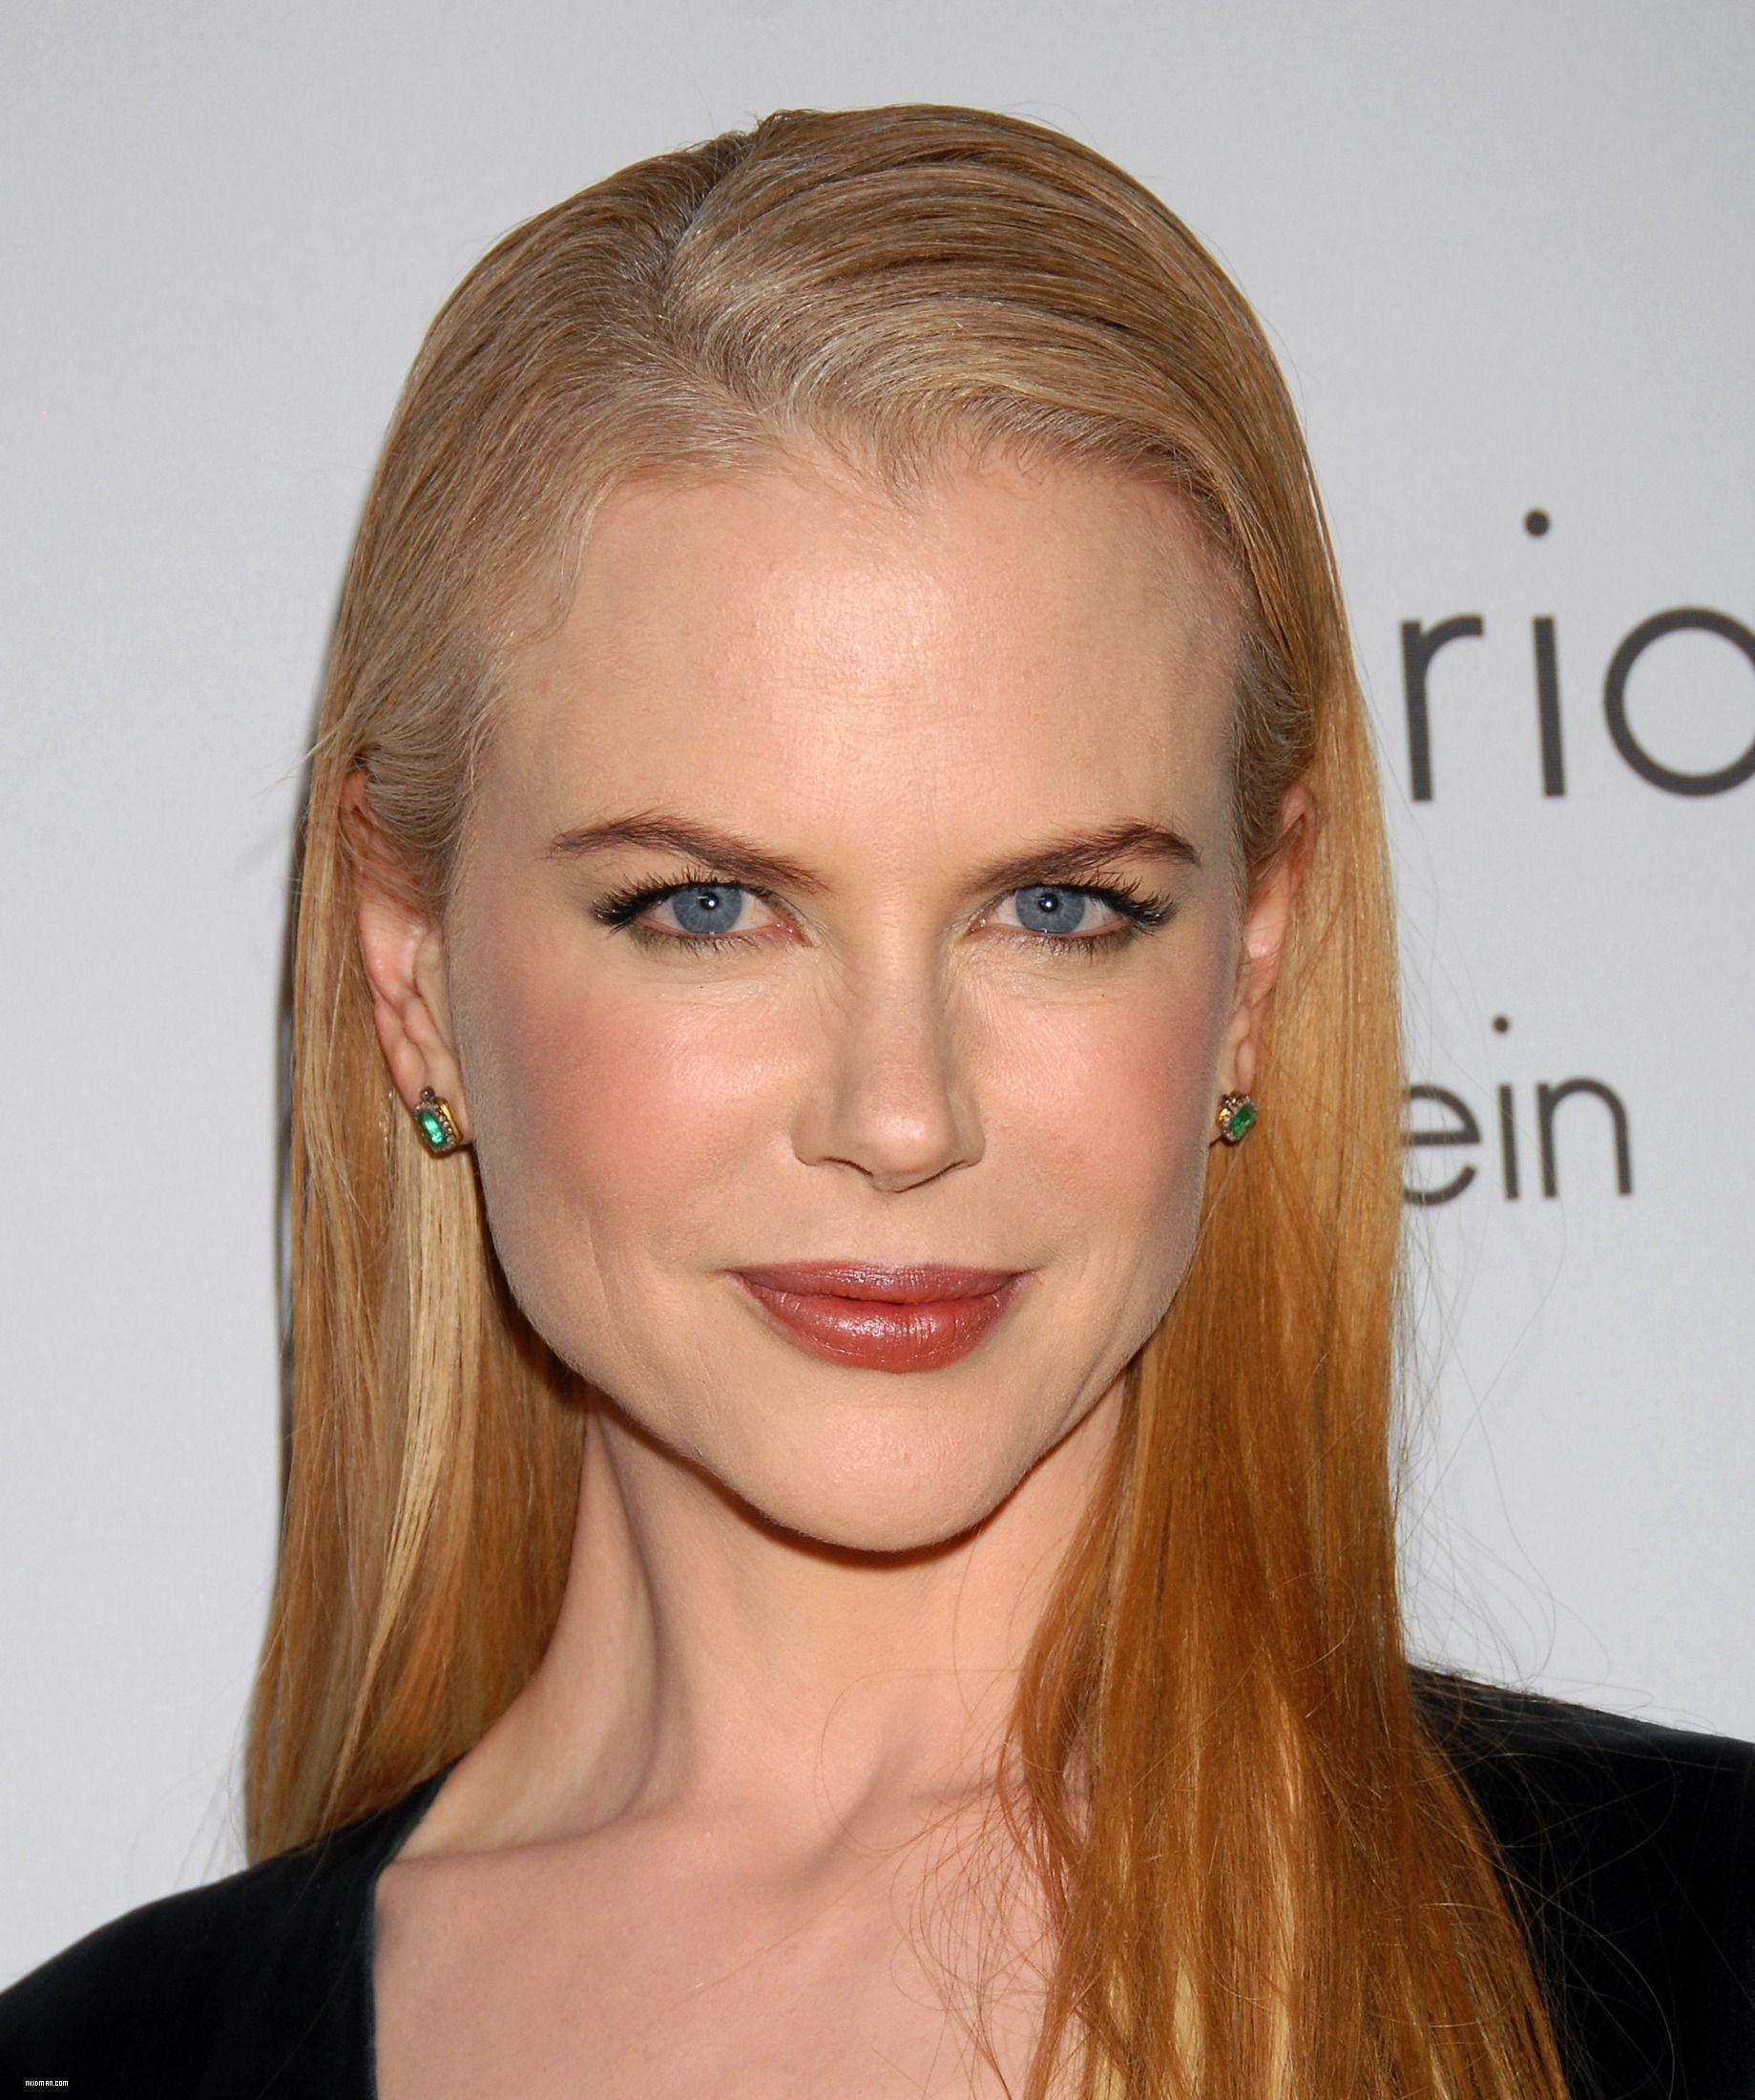 Nicole - Nicole Kidman Photo (4174808) - Fanpop